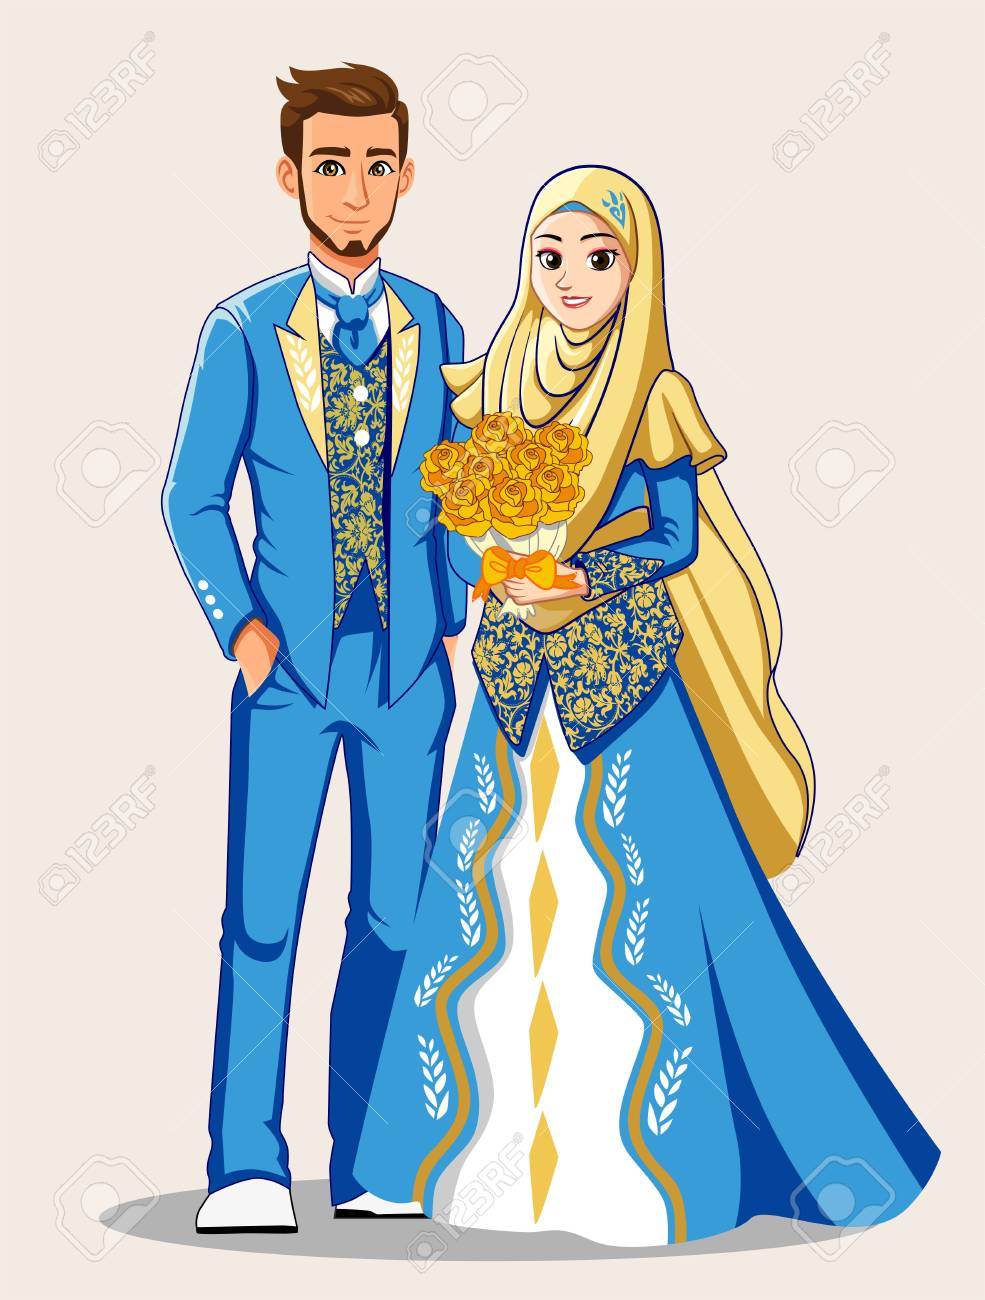 Sky Blue Muslim Wedding Dress - 92597176